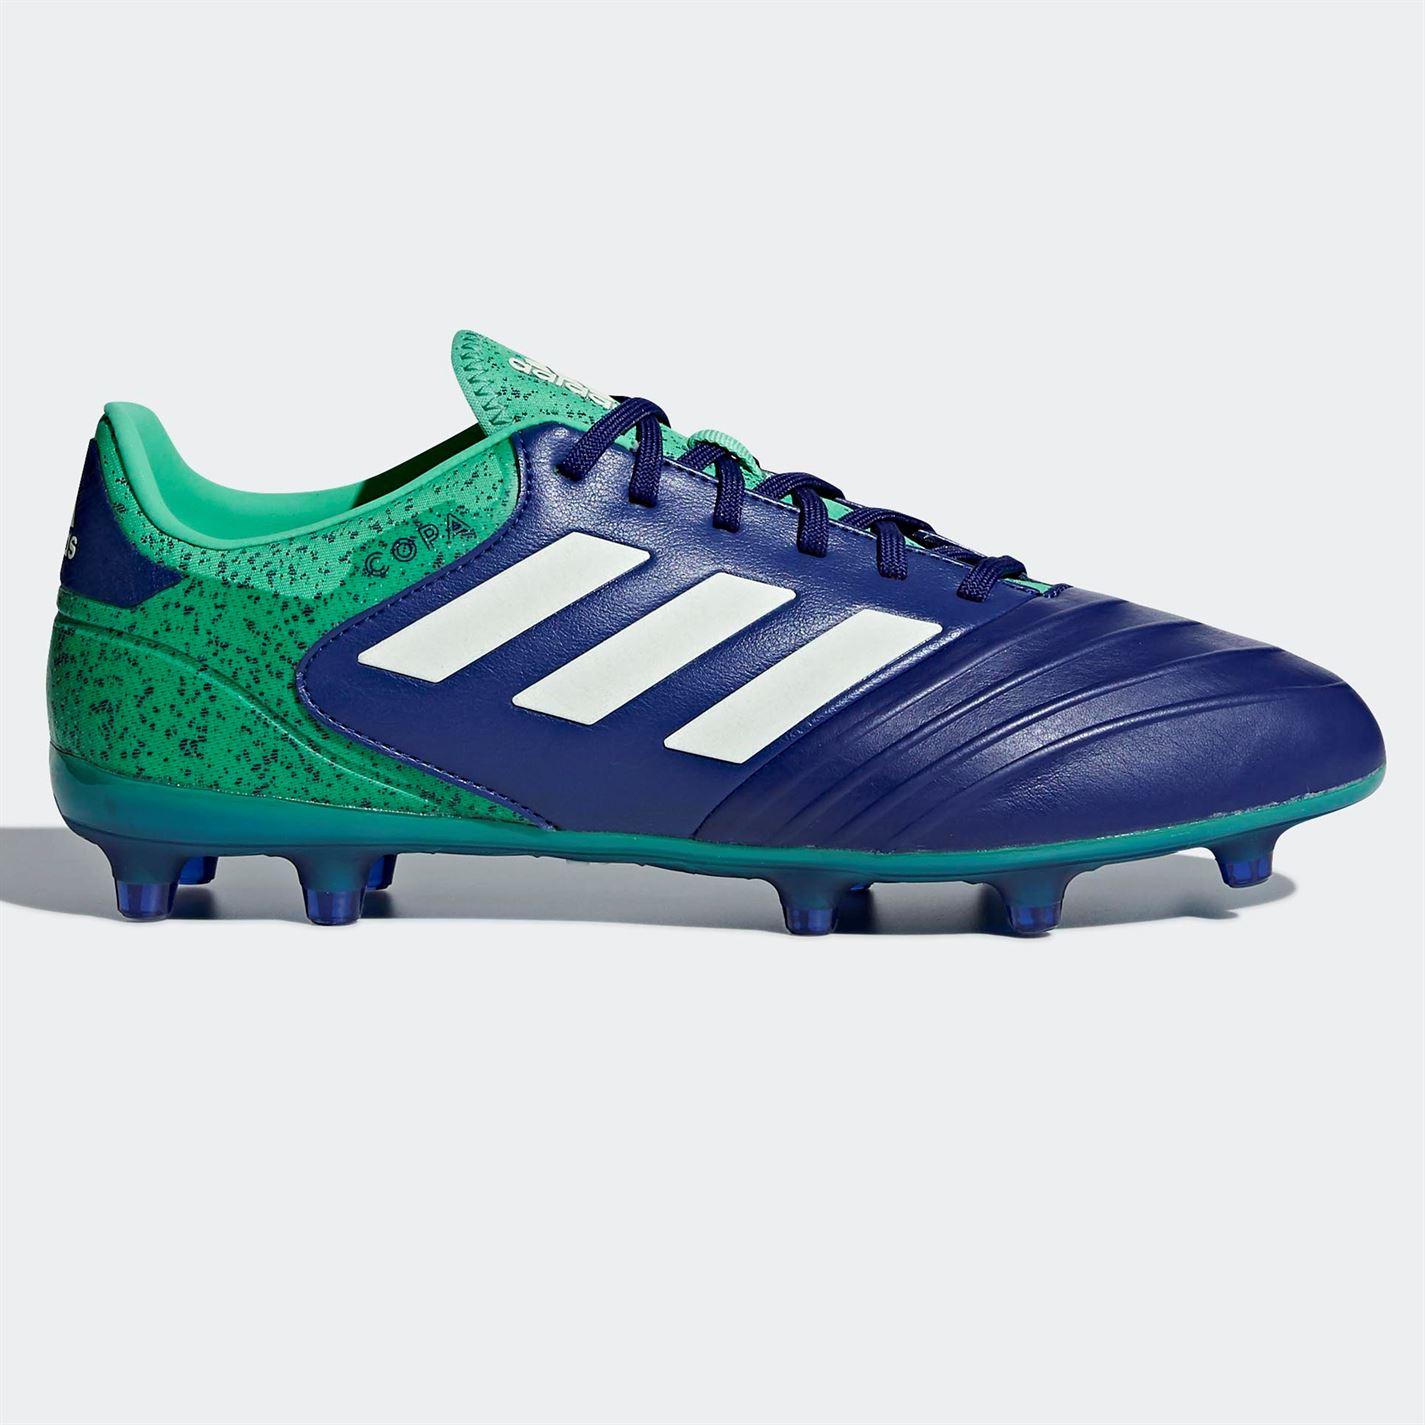 Adidas Copa 18.3 FG Mens Football Boots